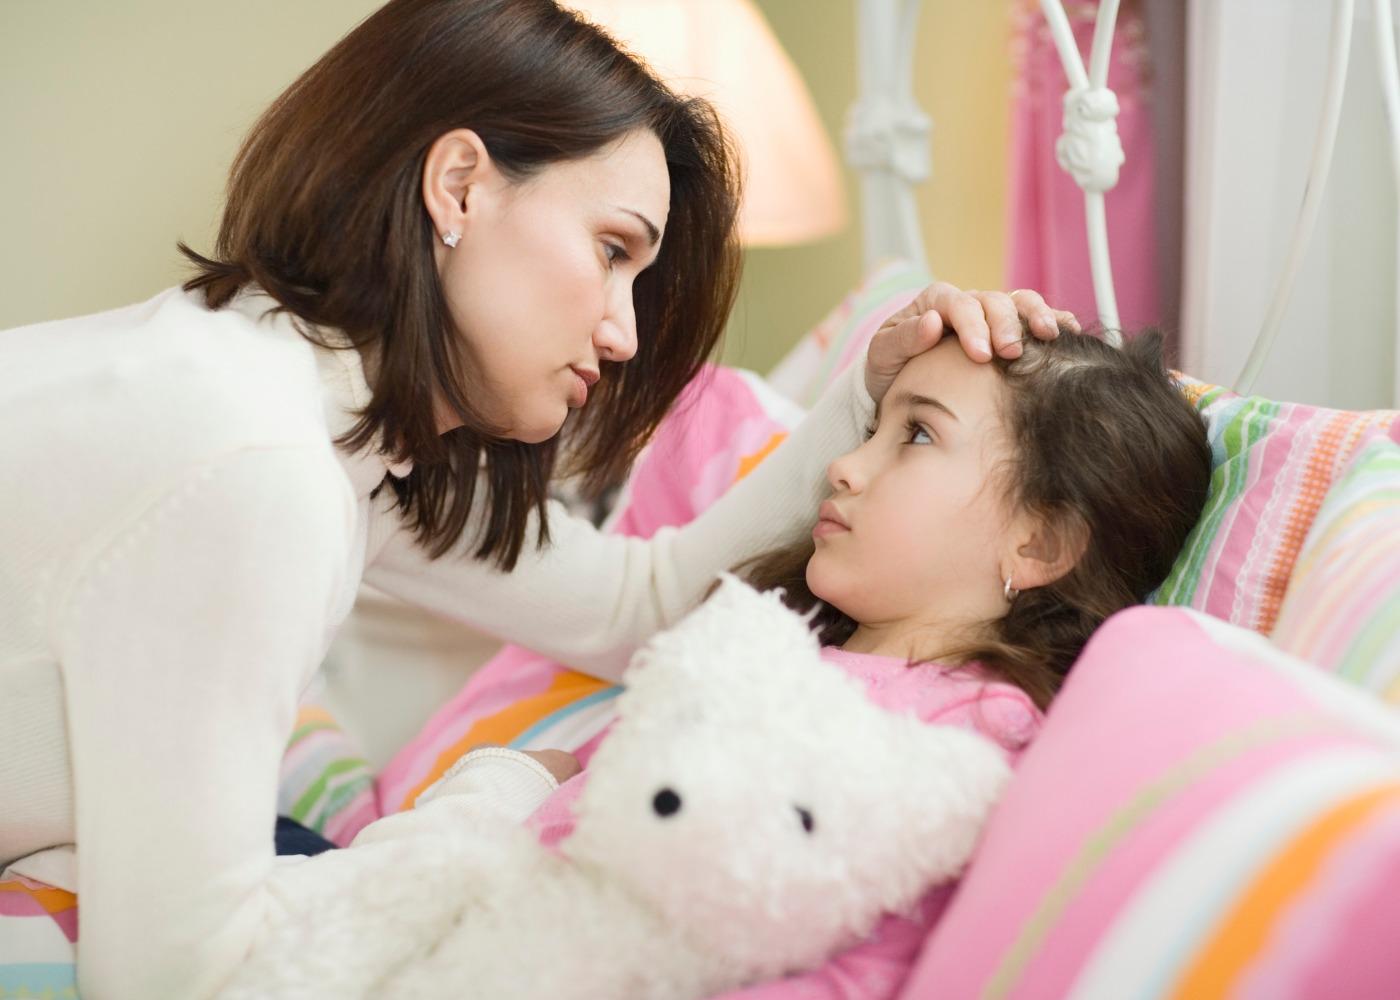 mãe a medir a febre a filha doente